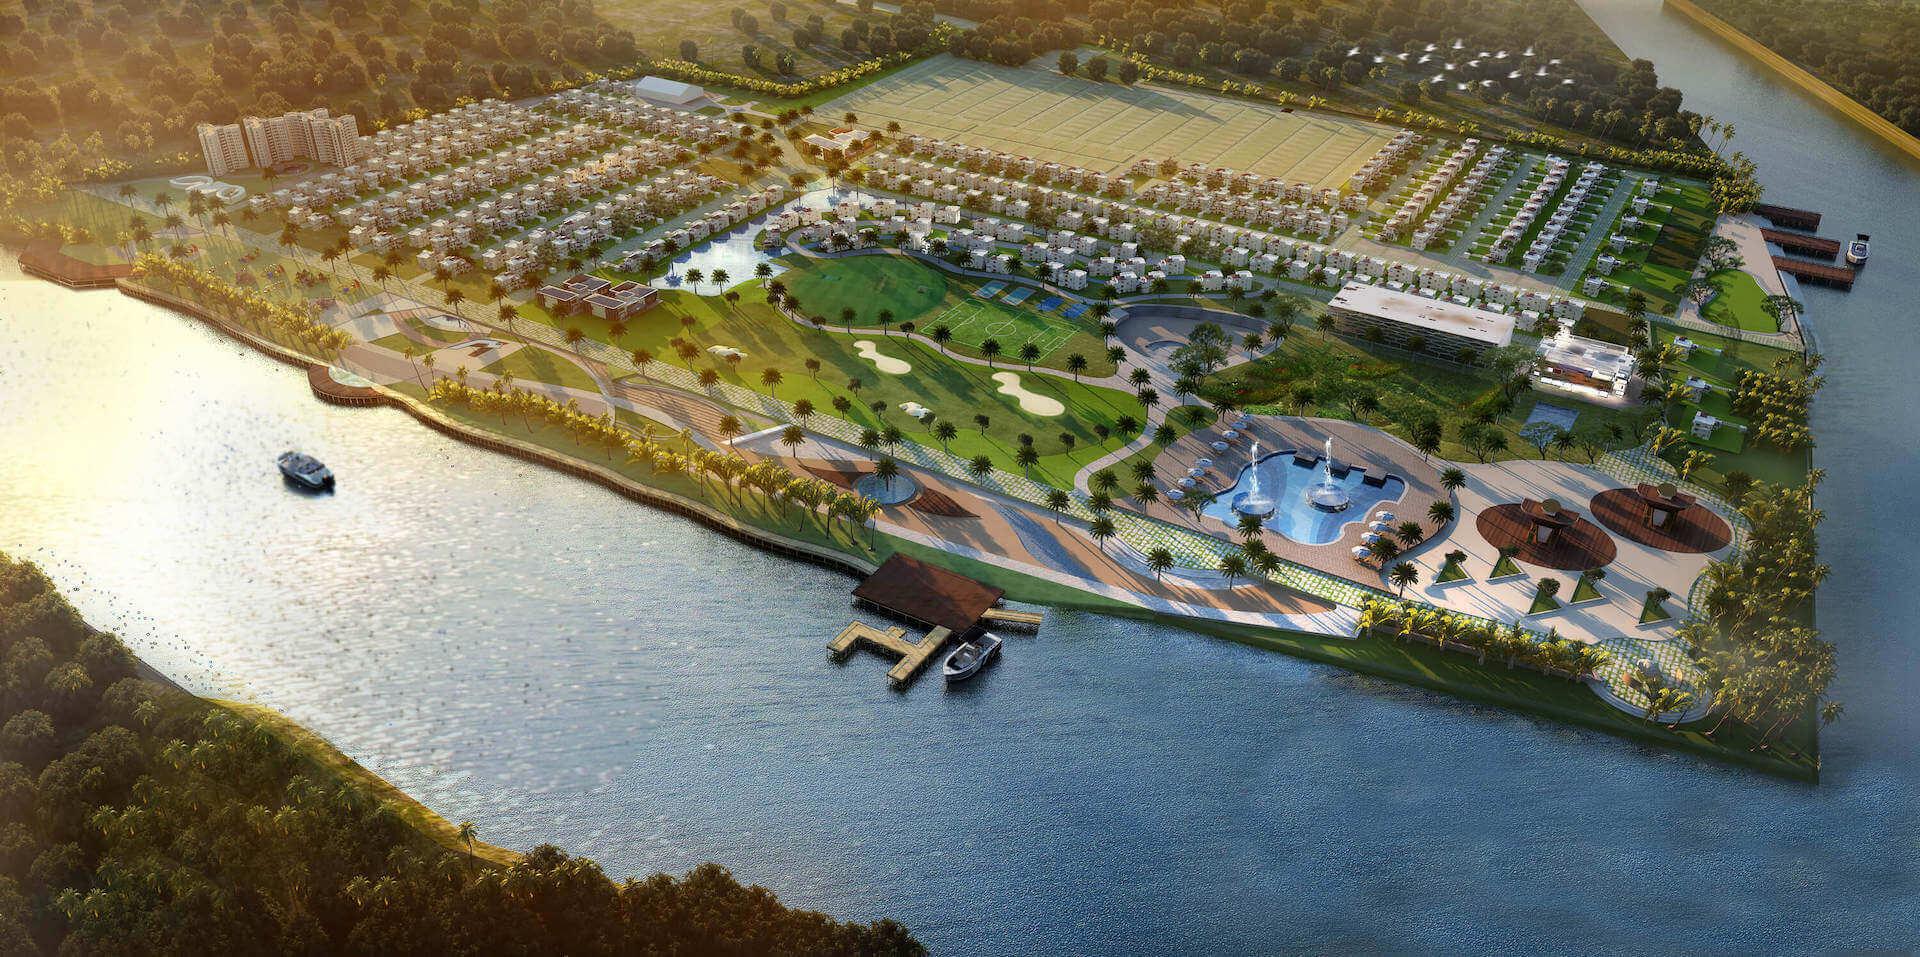 Alakananda RiverFront - Masterplan - Reduced for Website